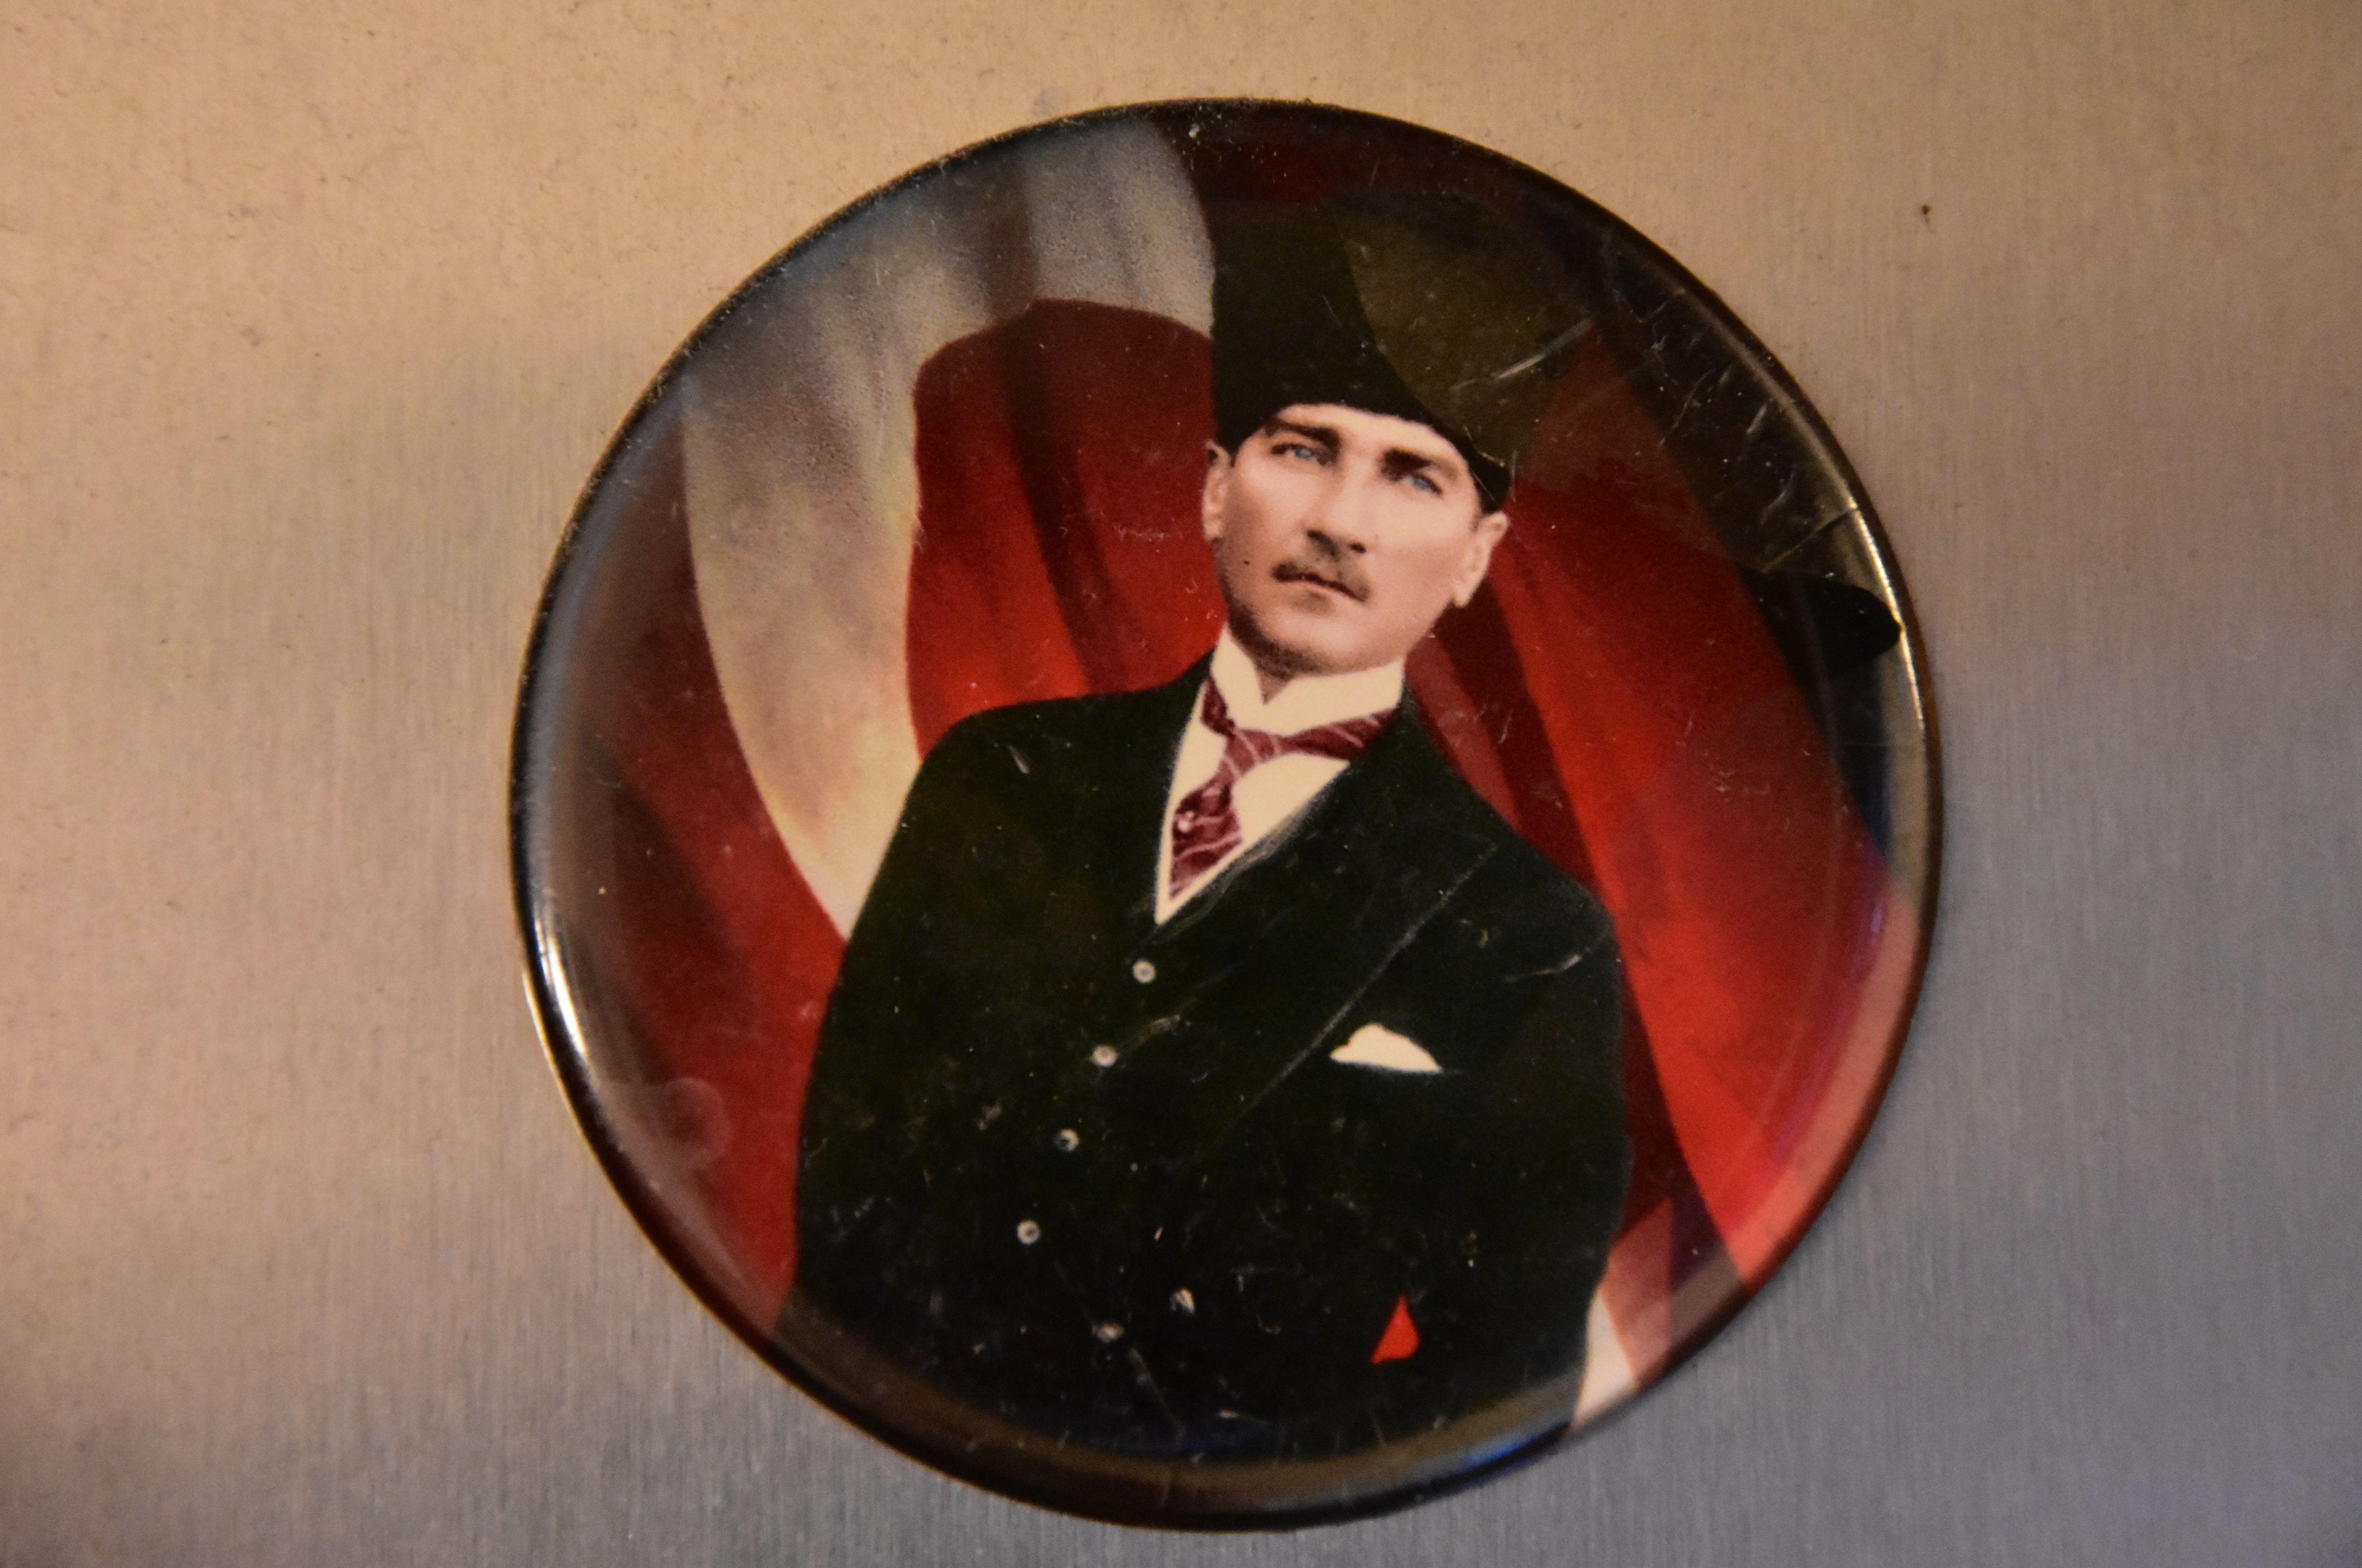 Atatürk als Kühlschrankmagnet